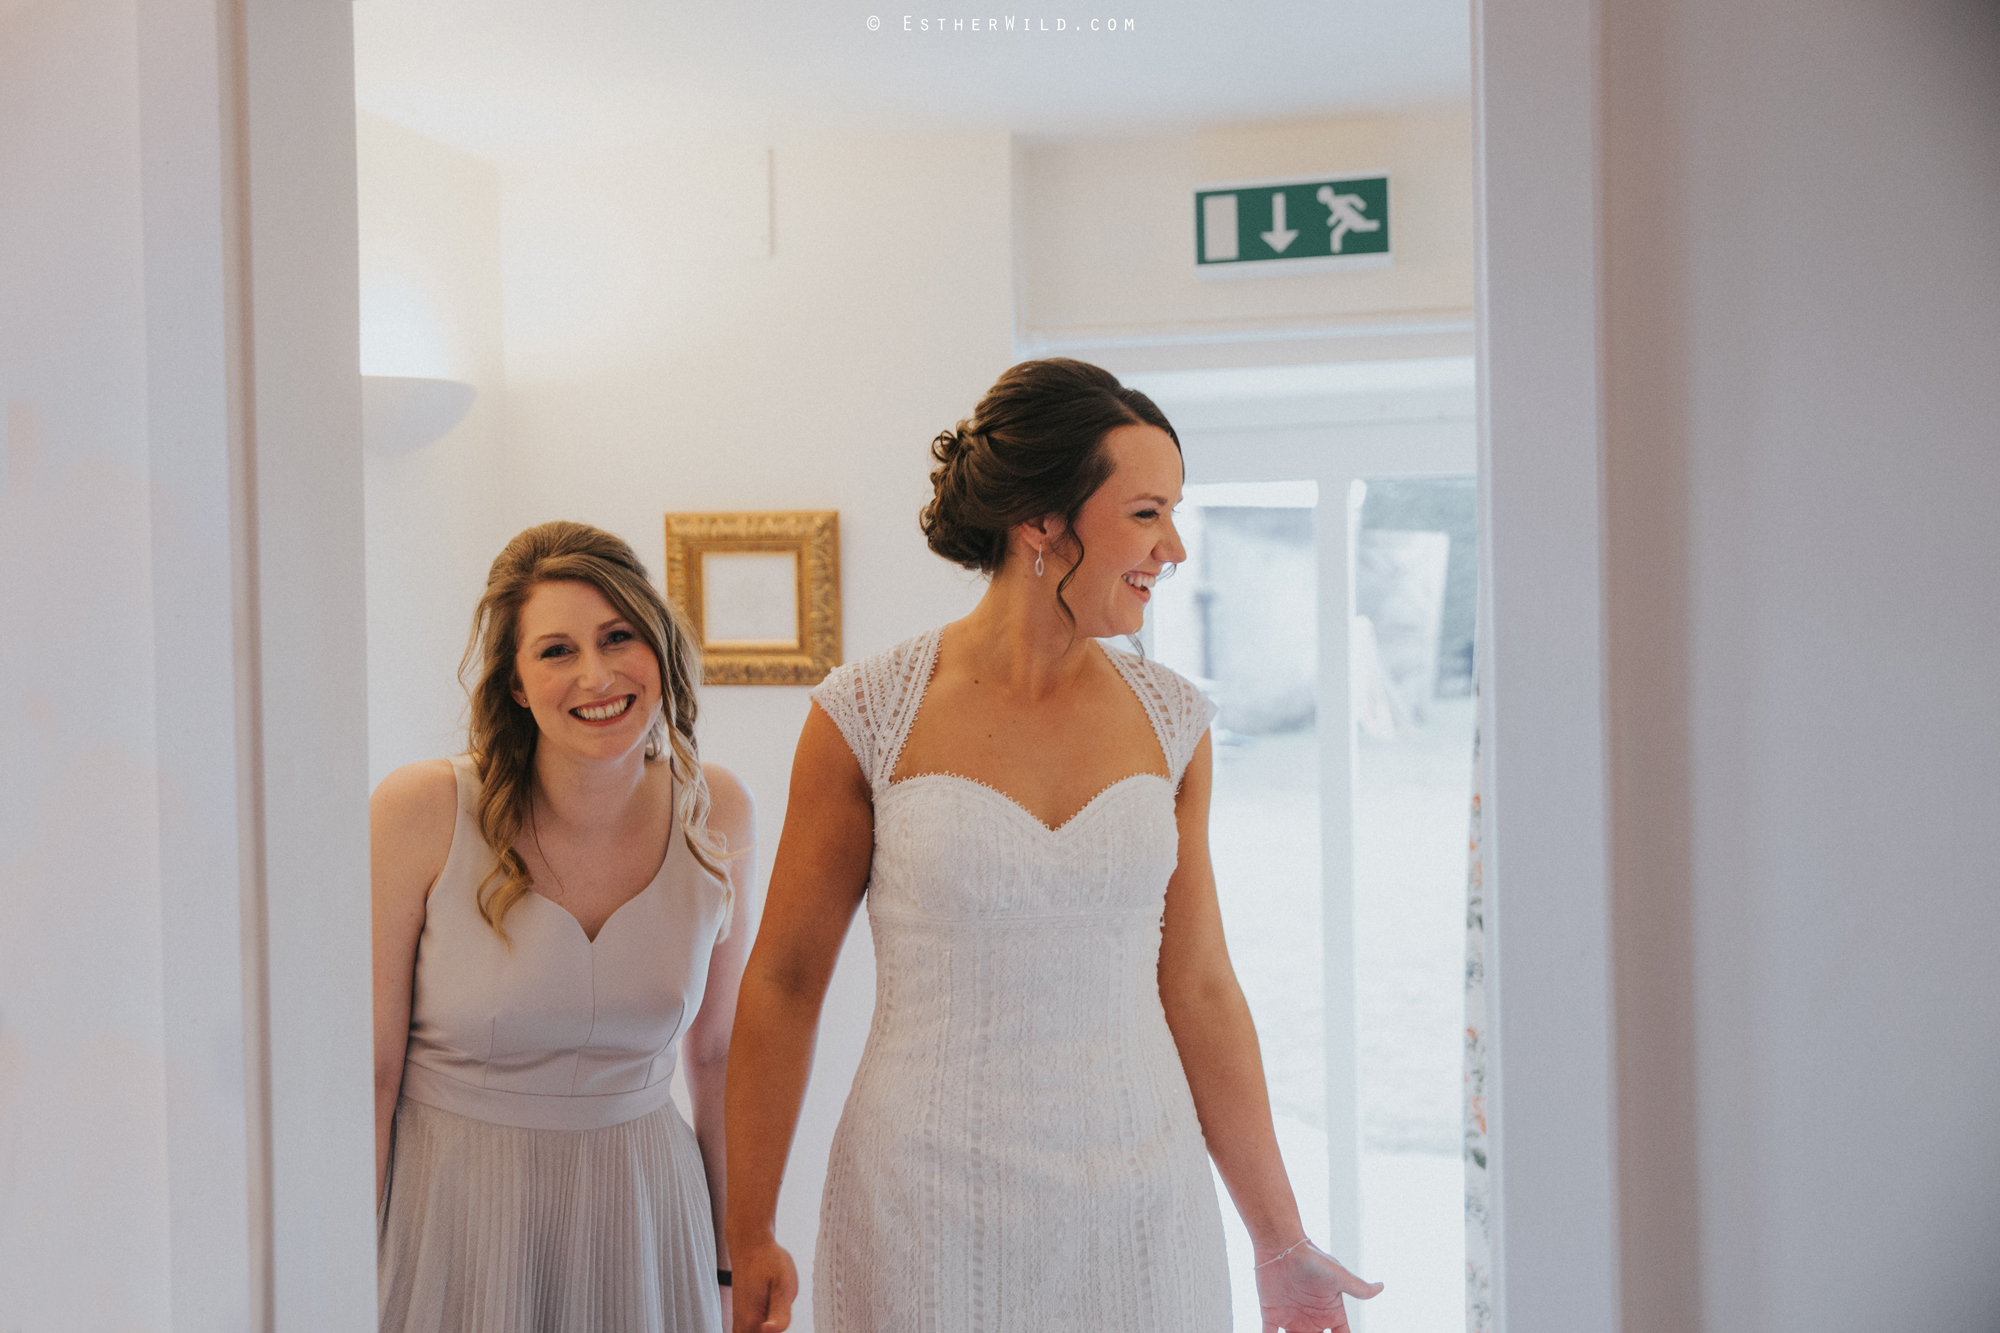 Elms_Barn_Weddings_Suffolk_Photographer_Copyright_Esther_Wild_IMG_0704.jpg